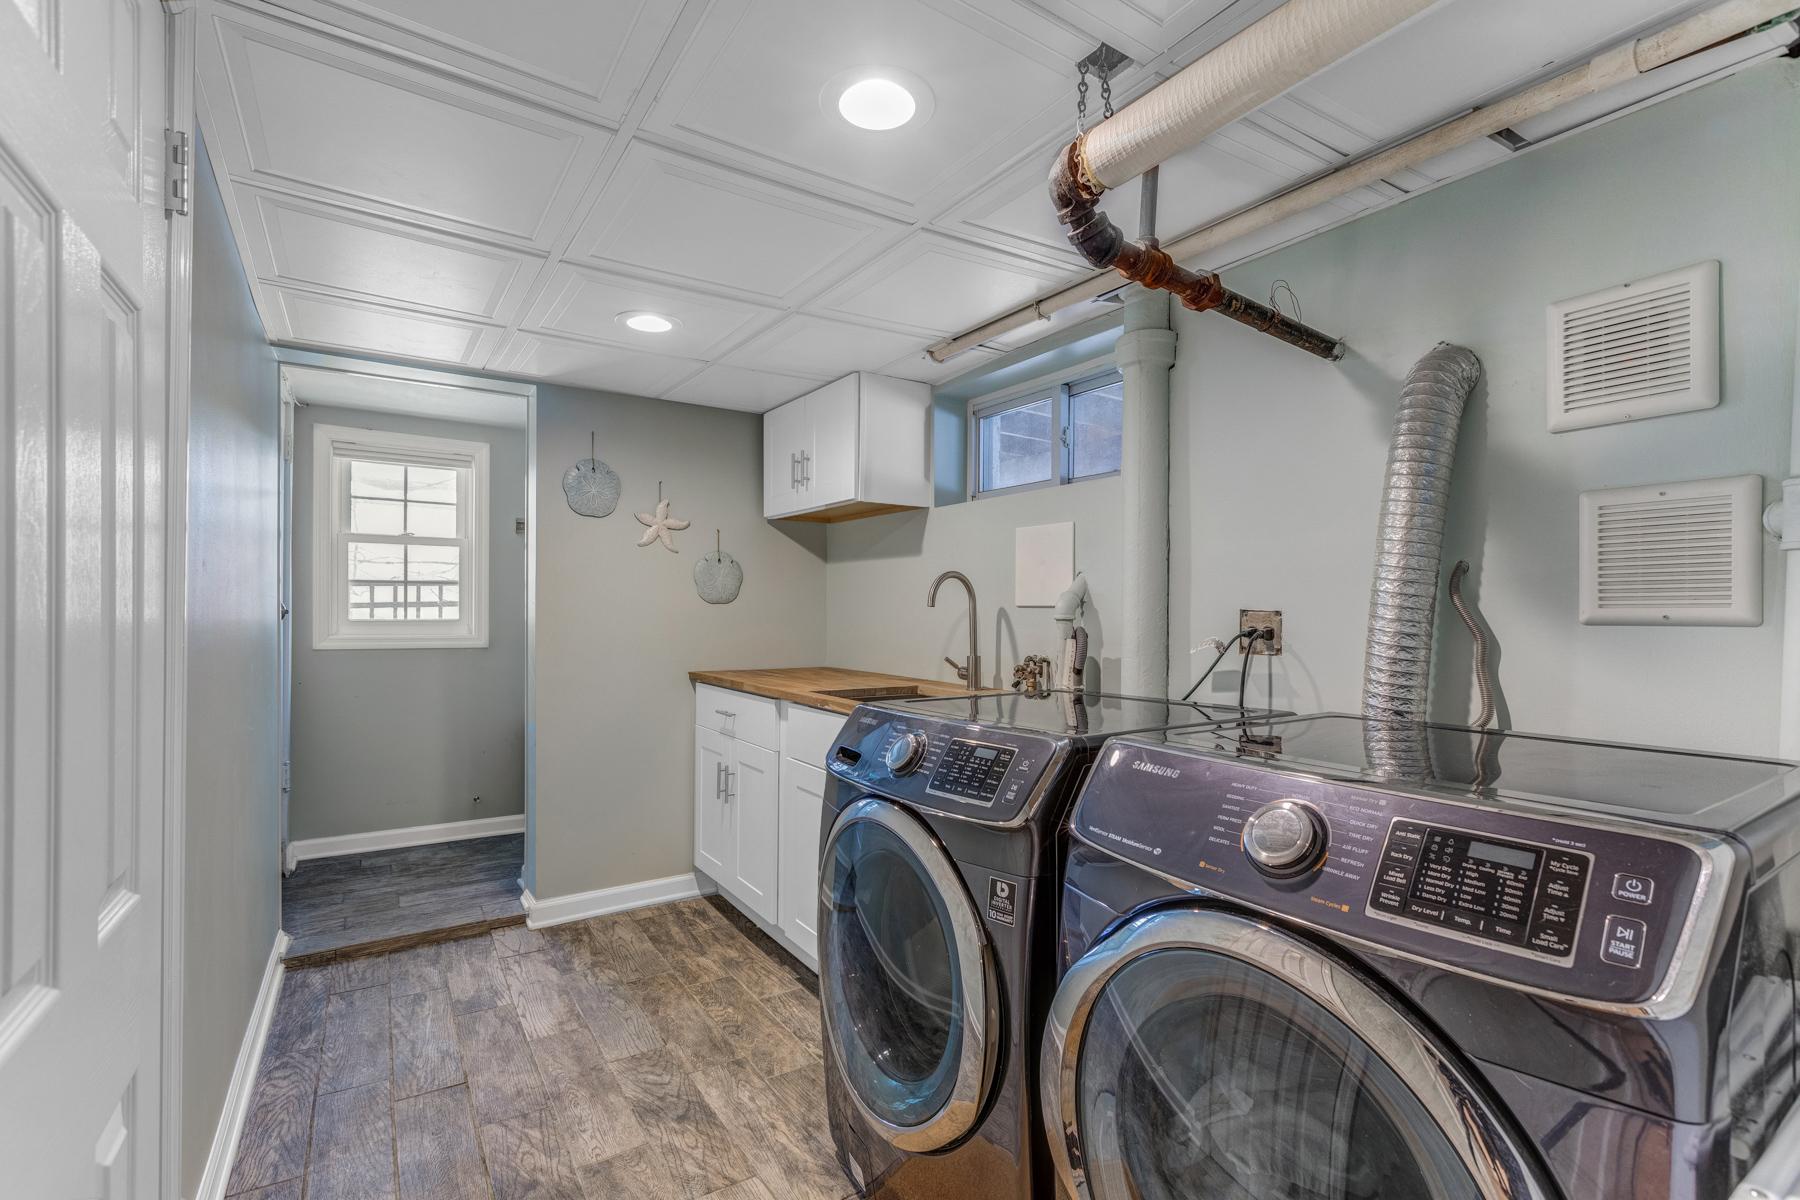 22. Laundry room_53A9419_20_21